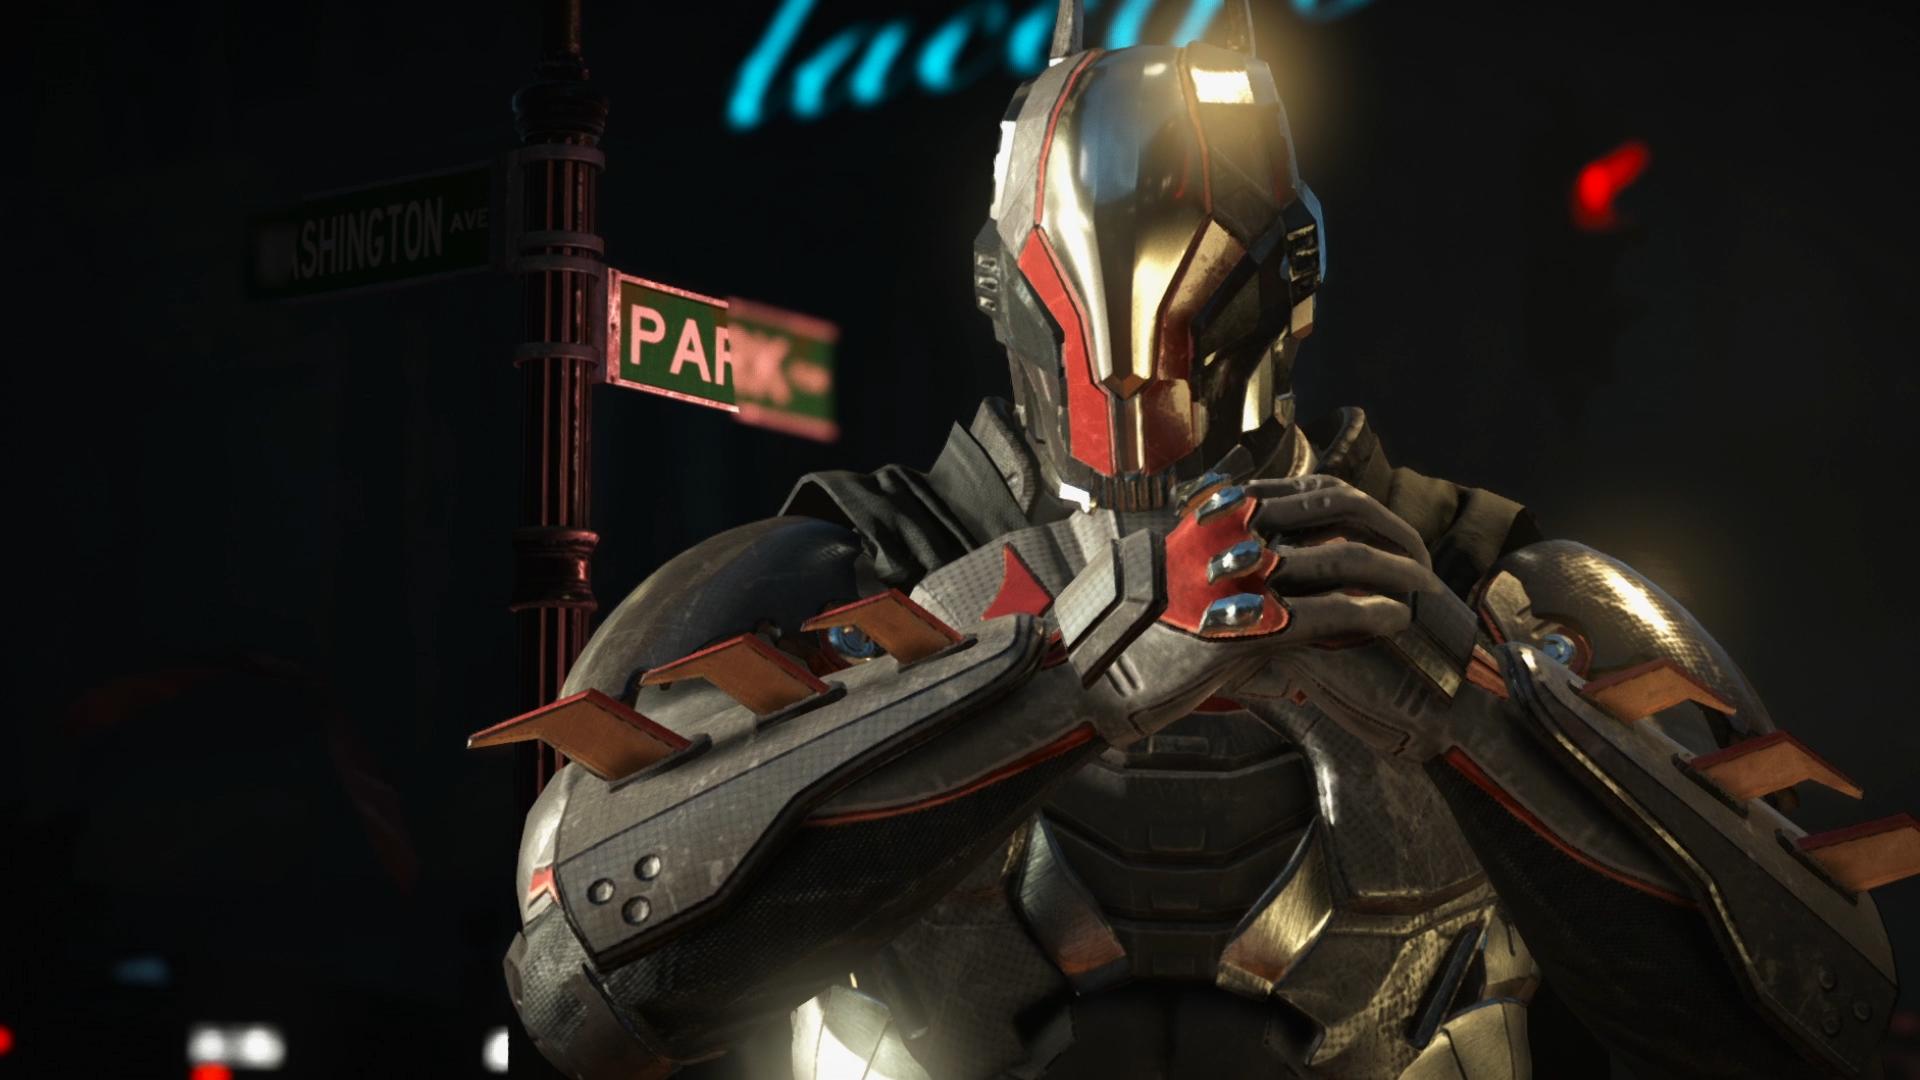 te-presentamos-gear-system-injustice-2-este-video-frikigamers.com